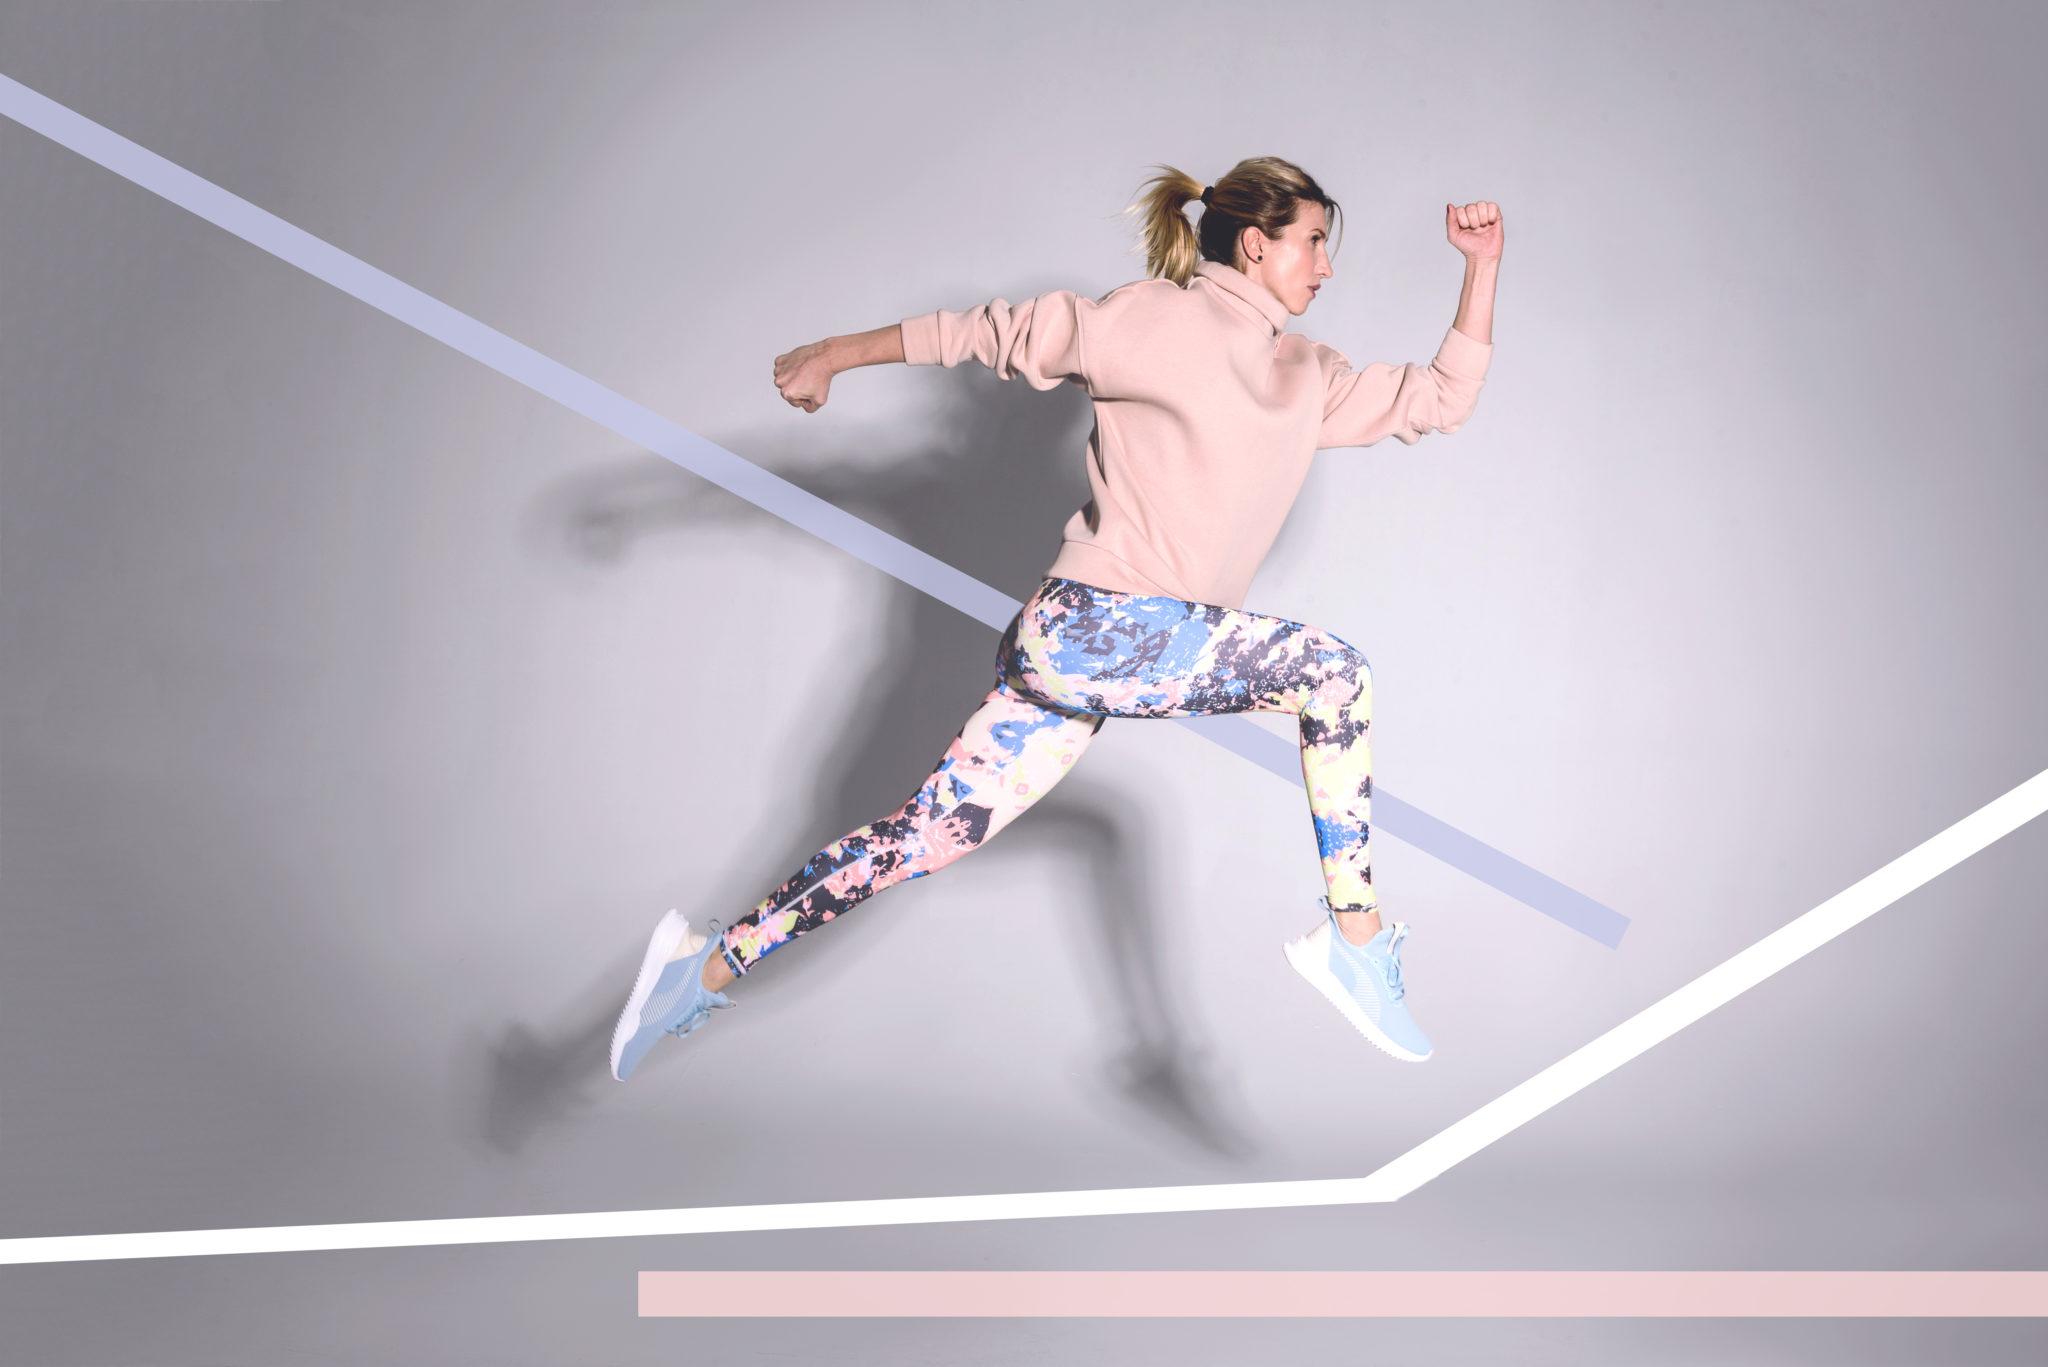 Lookbook портфолио фотостудии Frontpage, фотограф Алиса Постникова, бренд Wowbody Shop, модель Анита Луценко